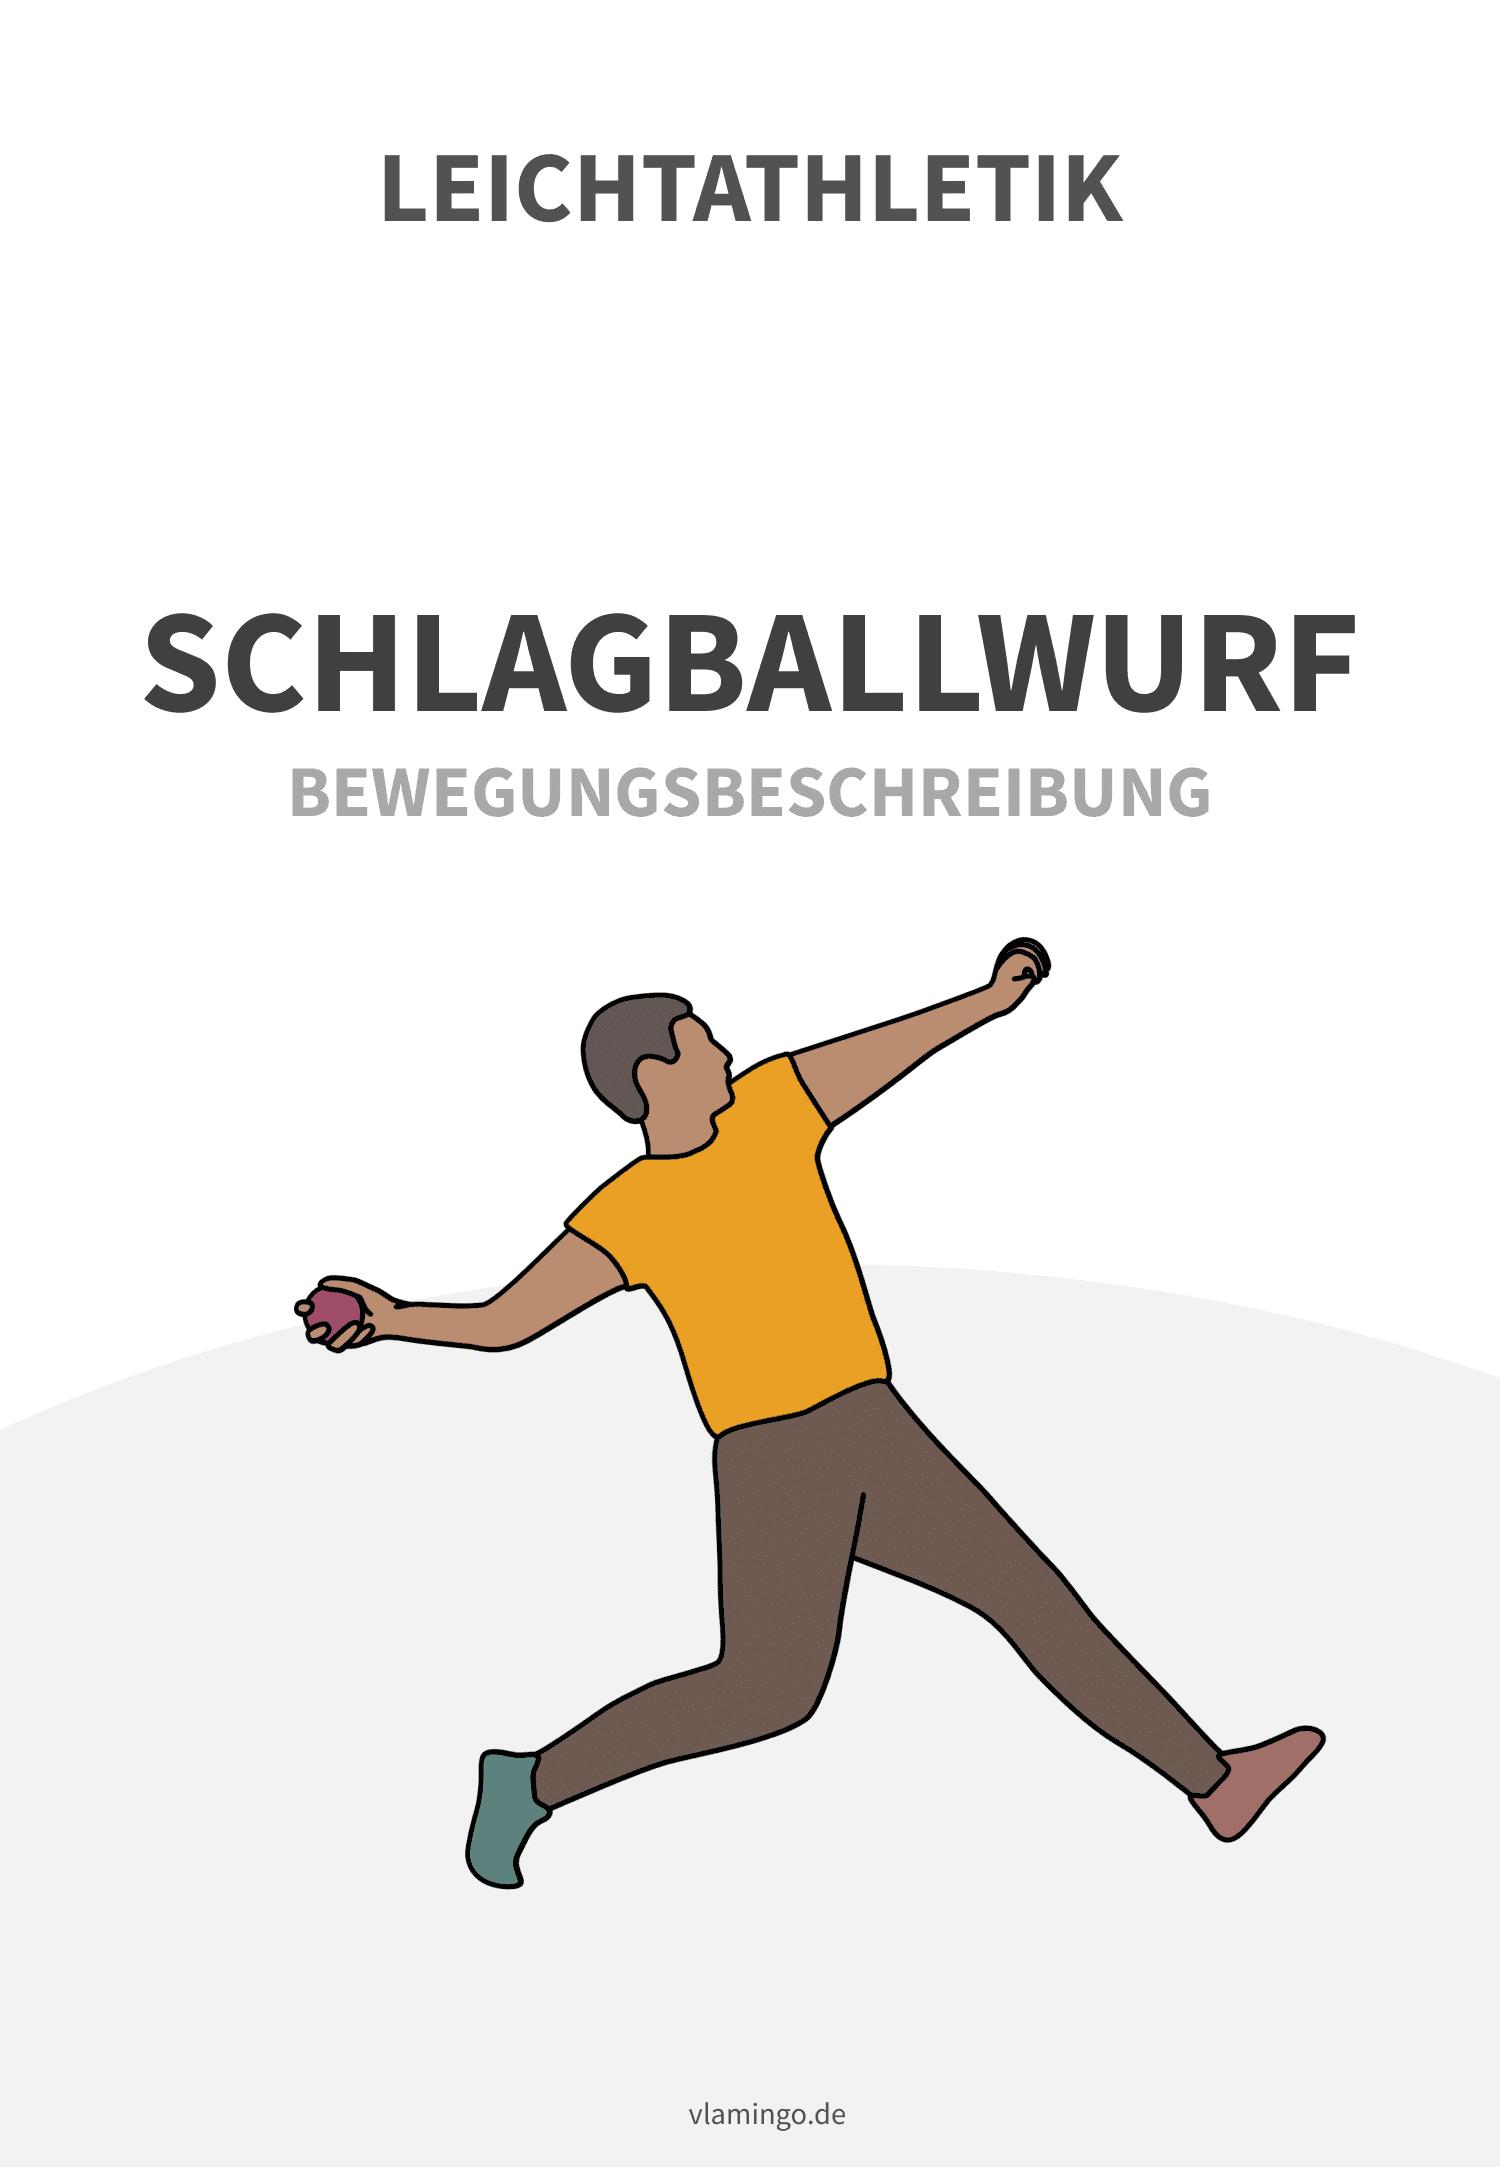 Leichtathletik - Schlagballwurf